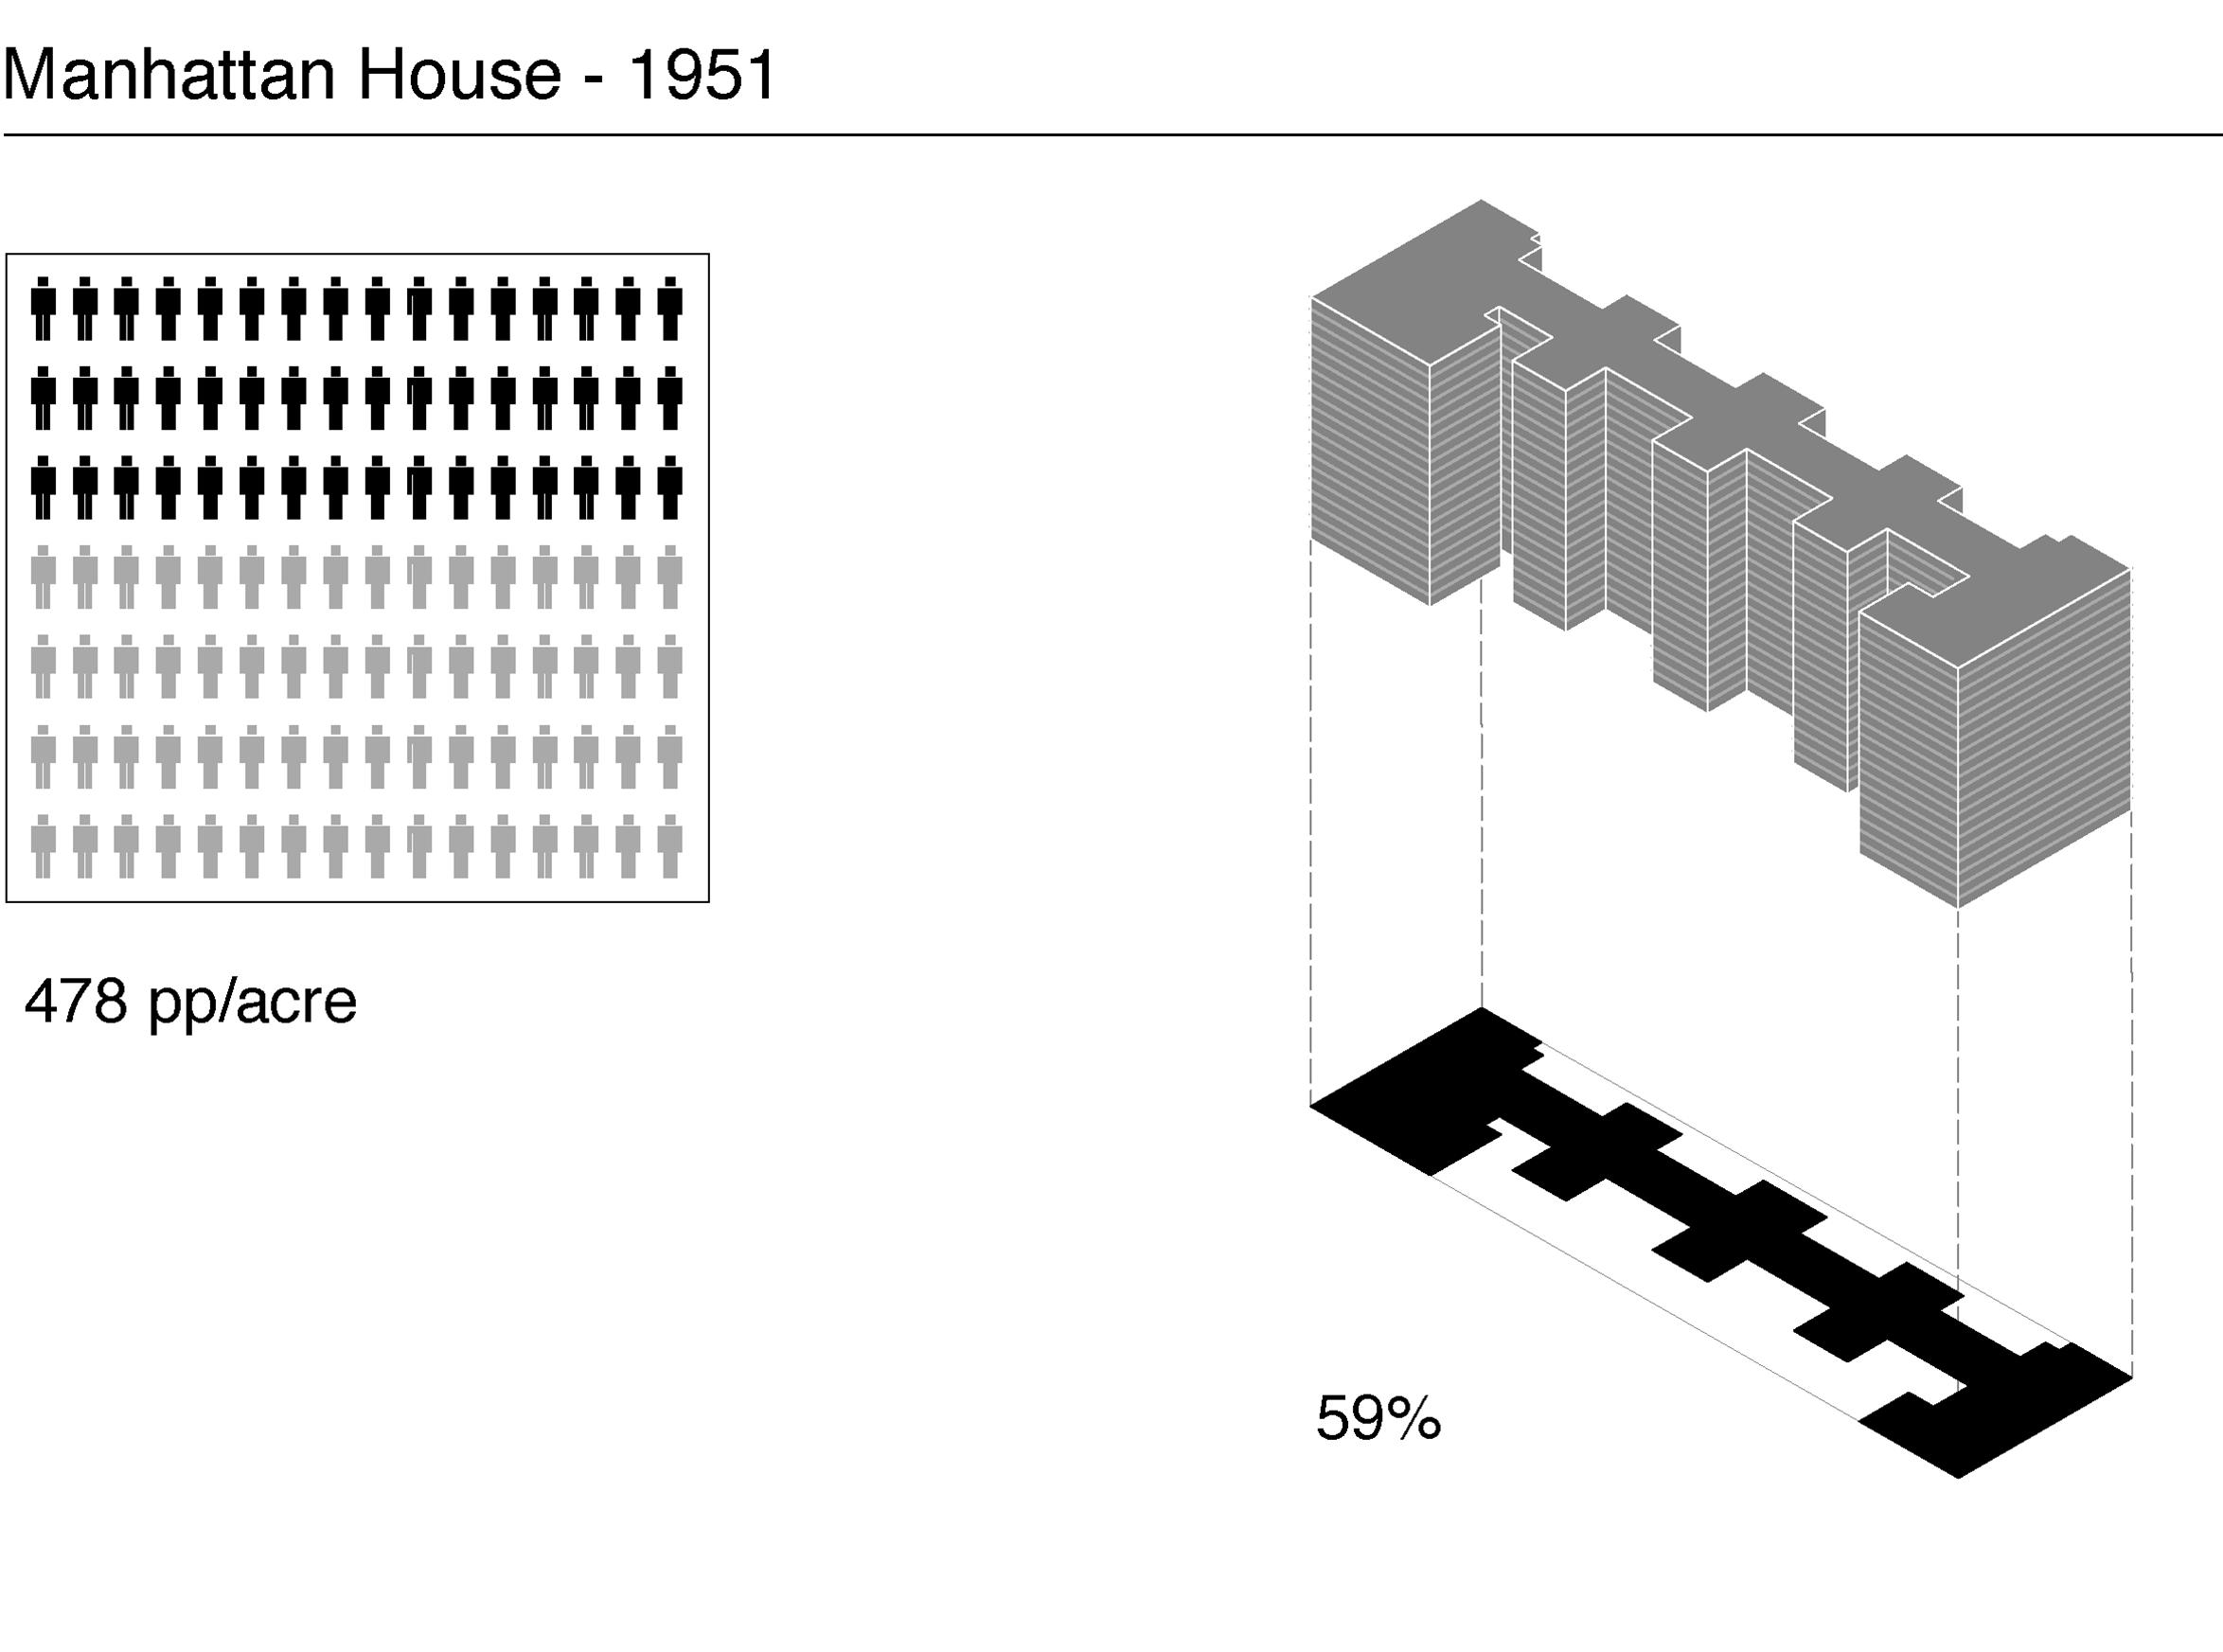 Manhattan House infographic. Skyscraper Museum.